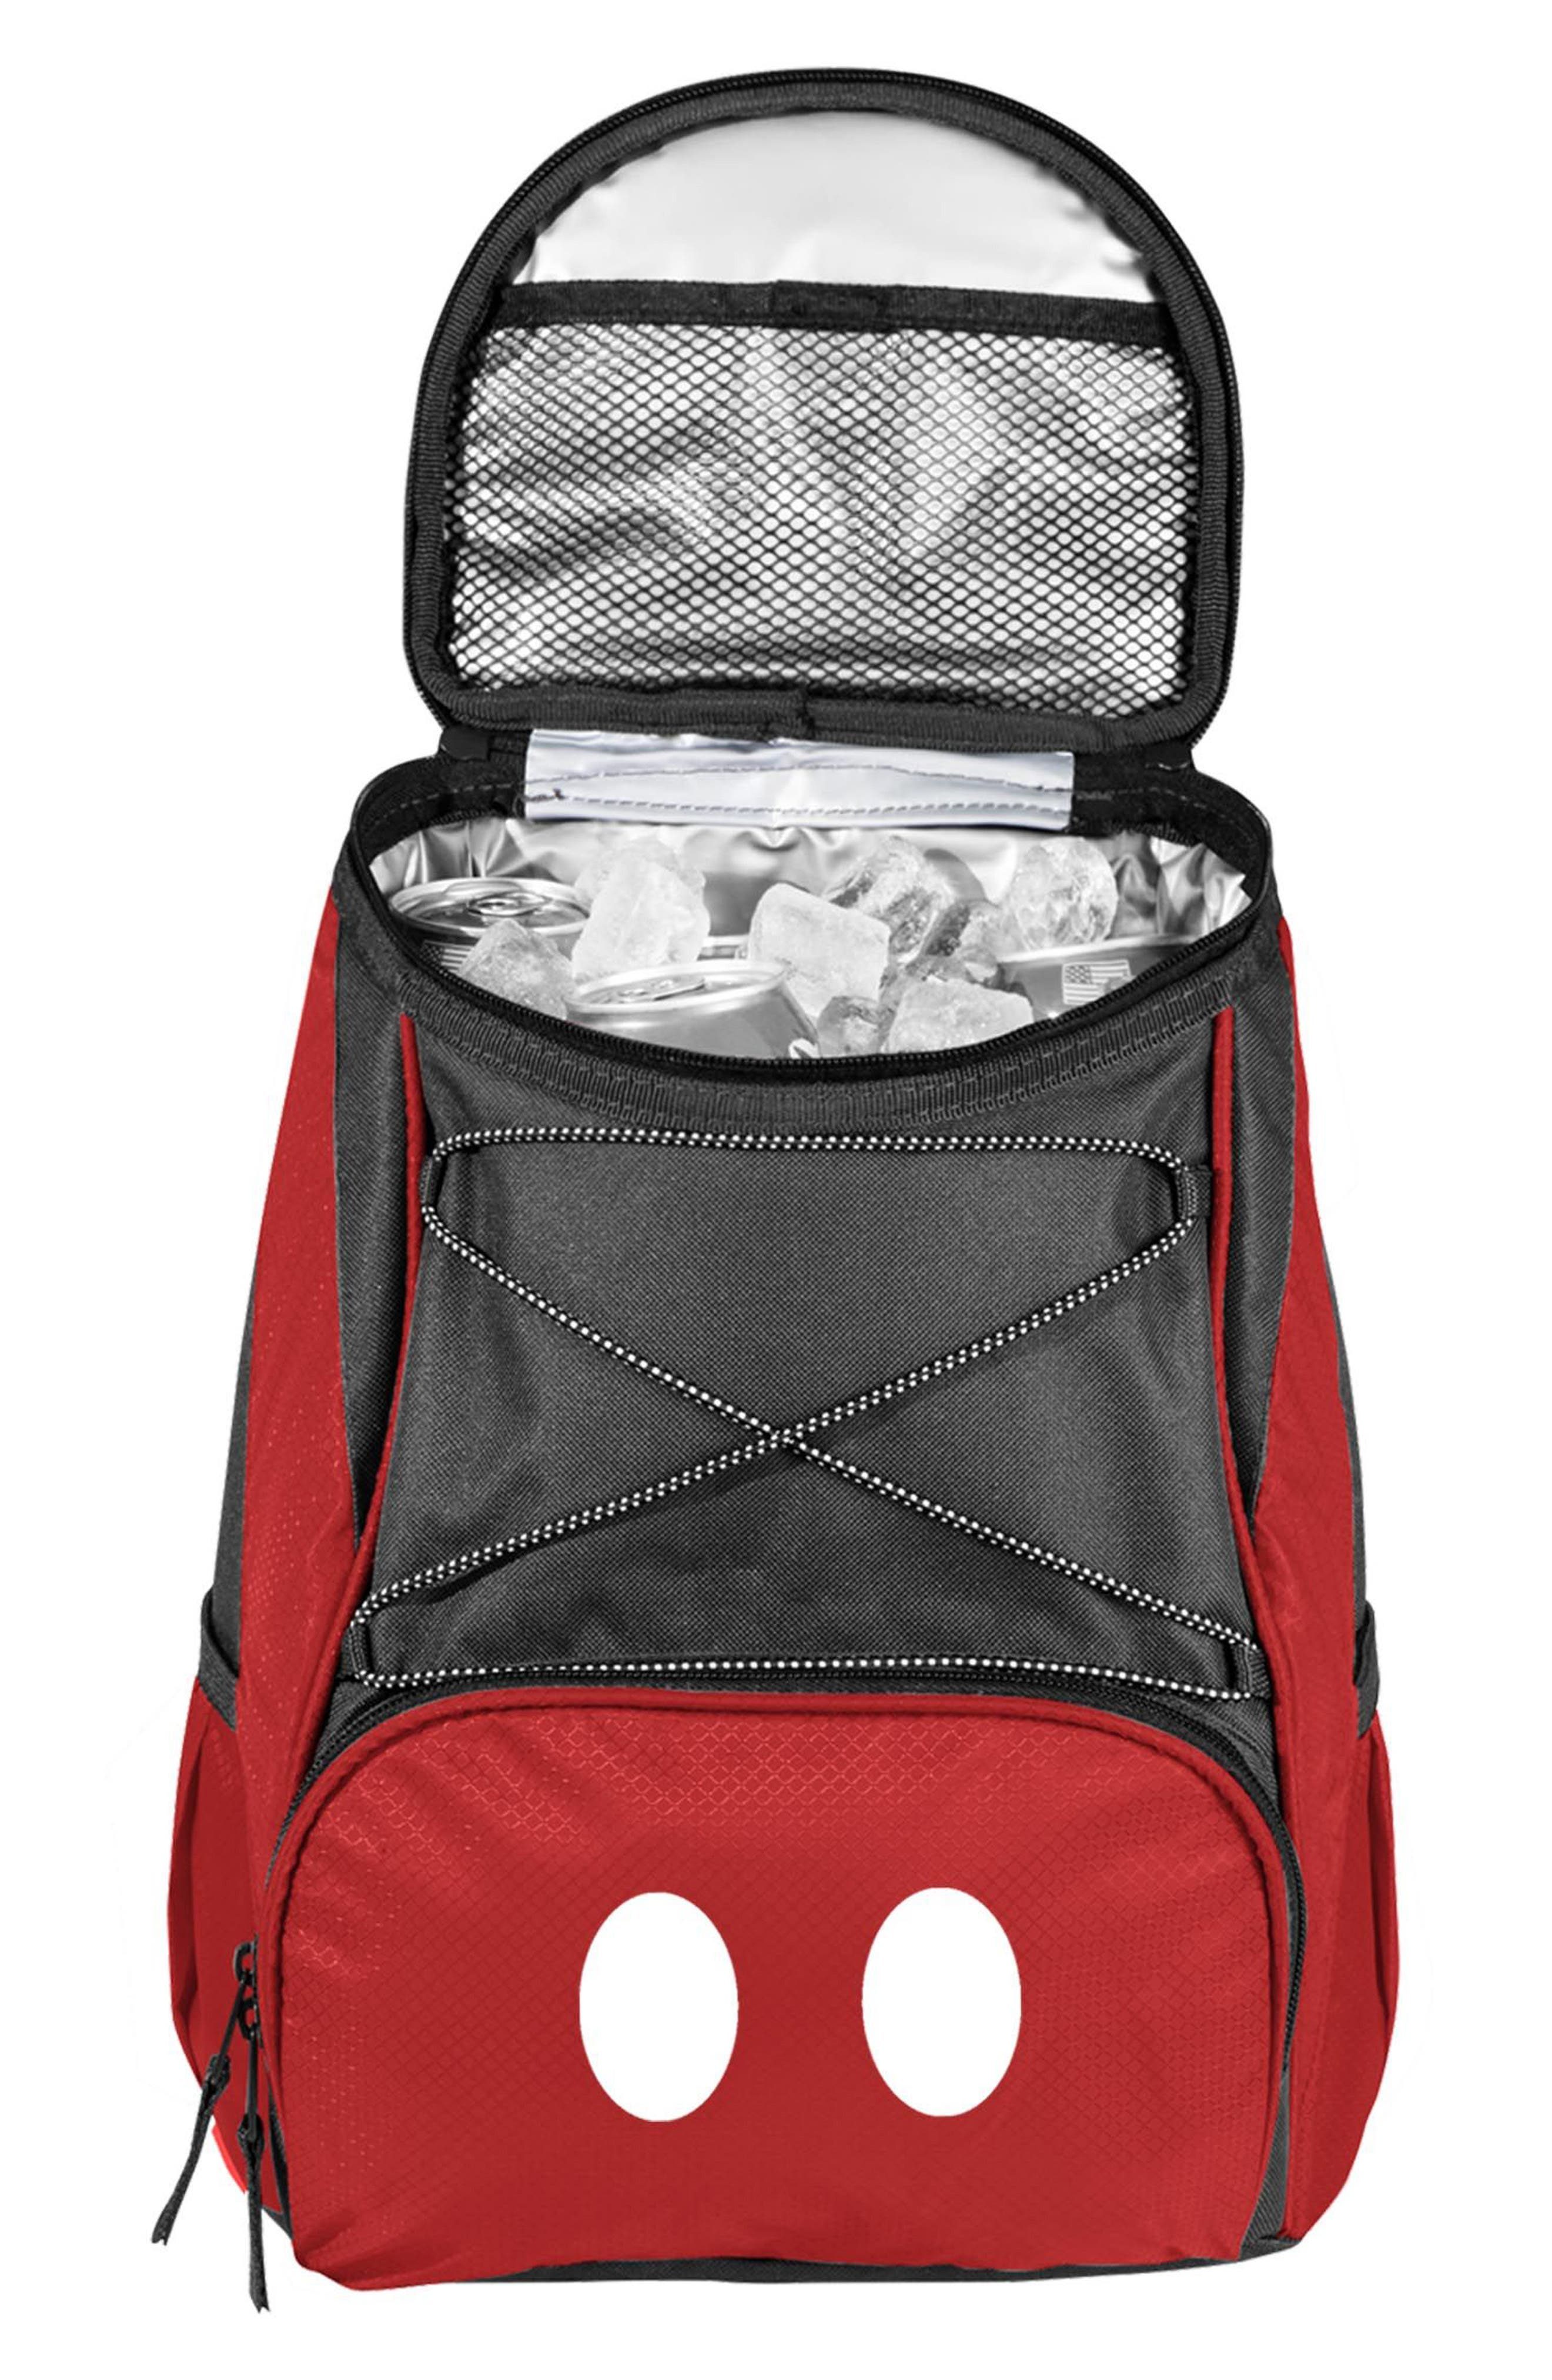 PTX - Disney Water Resistant Backpack Cooler,                             Alternate thumbnail 2, color,                             RED